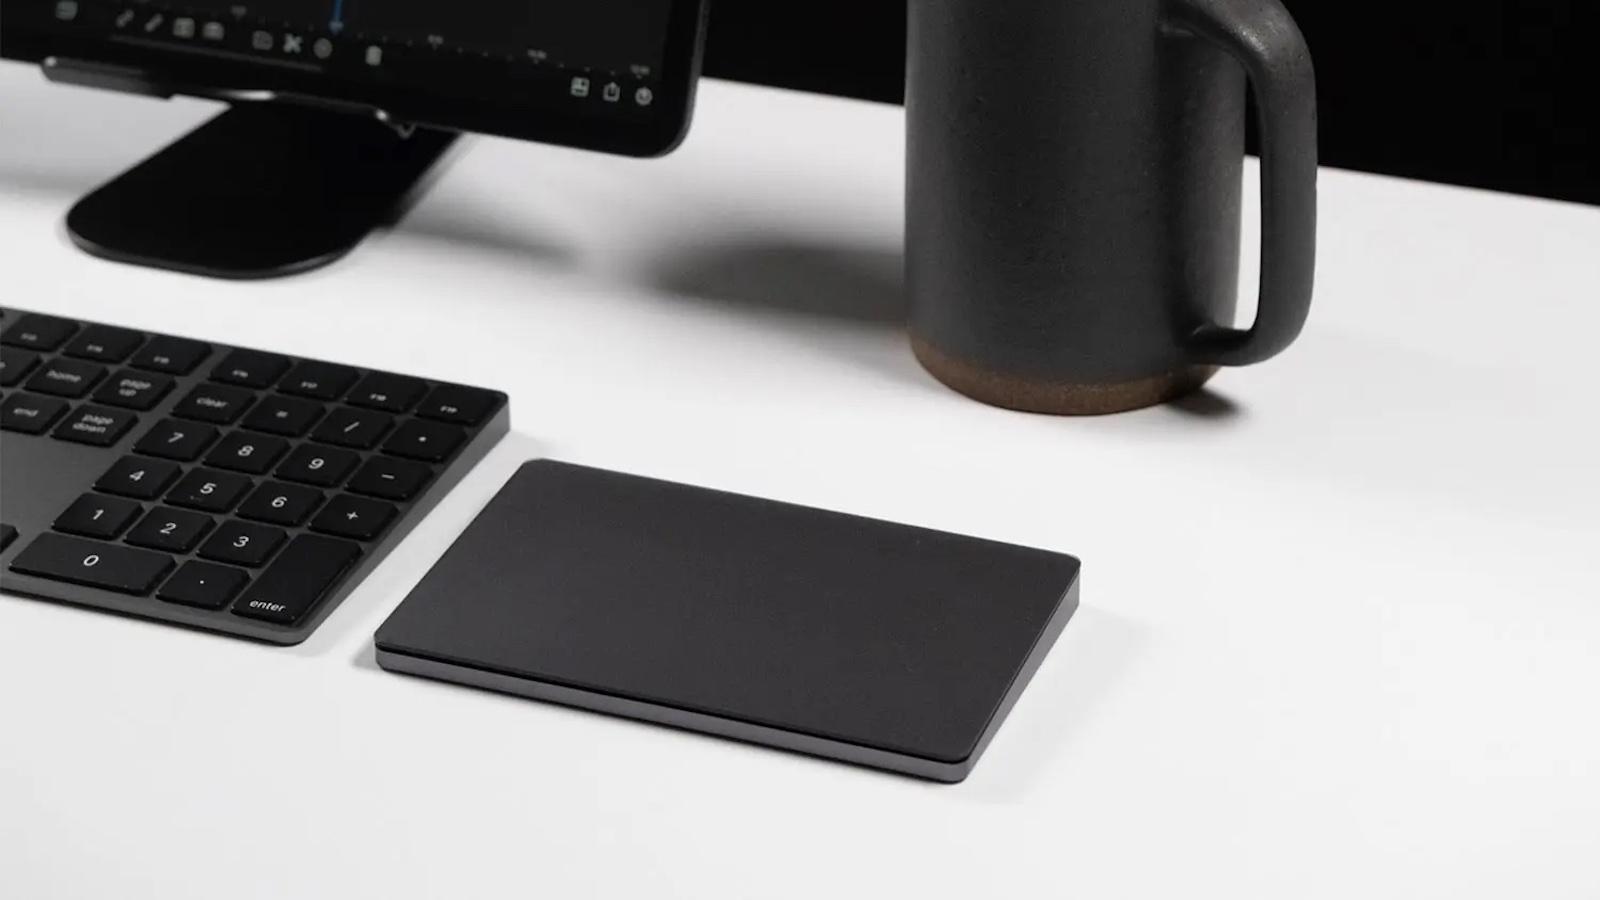 Brydge-iTrack-desktop-trackpad-for-iPadOS-01.jpeg